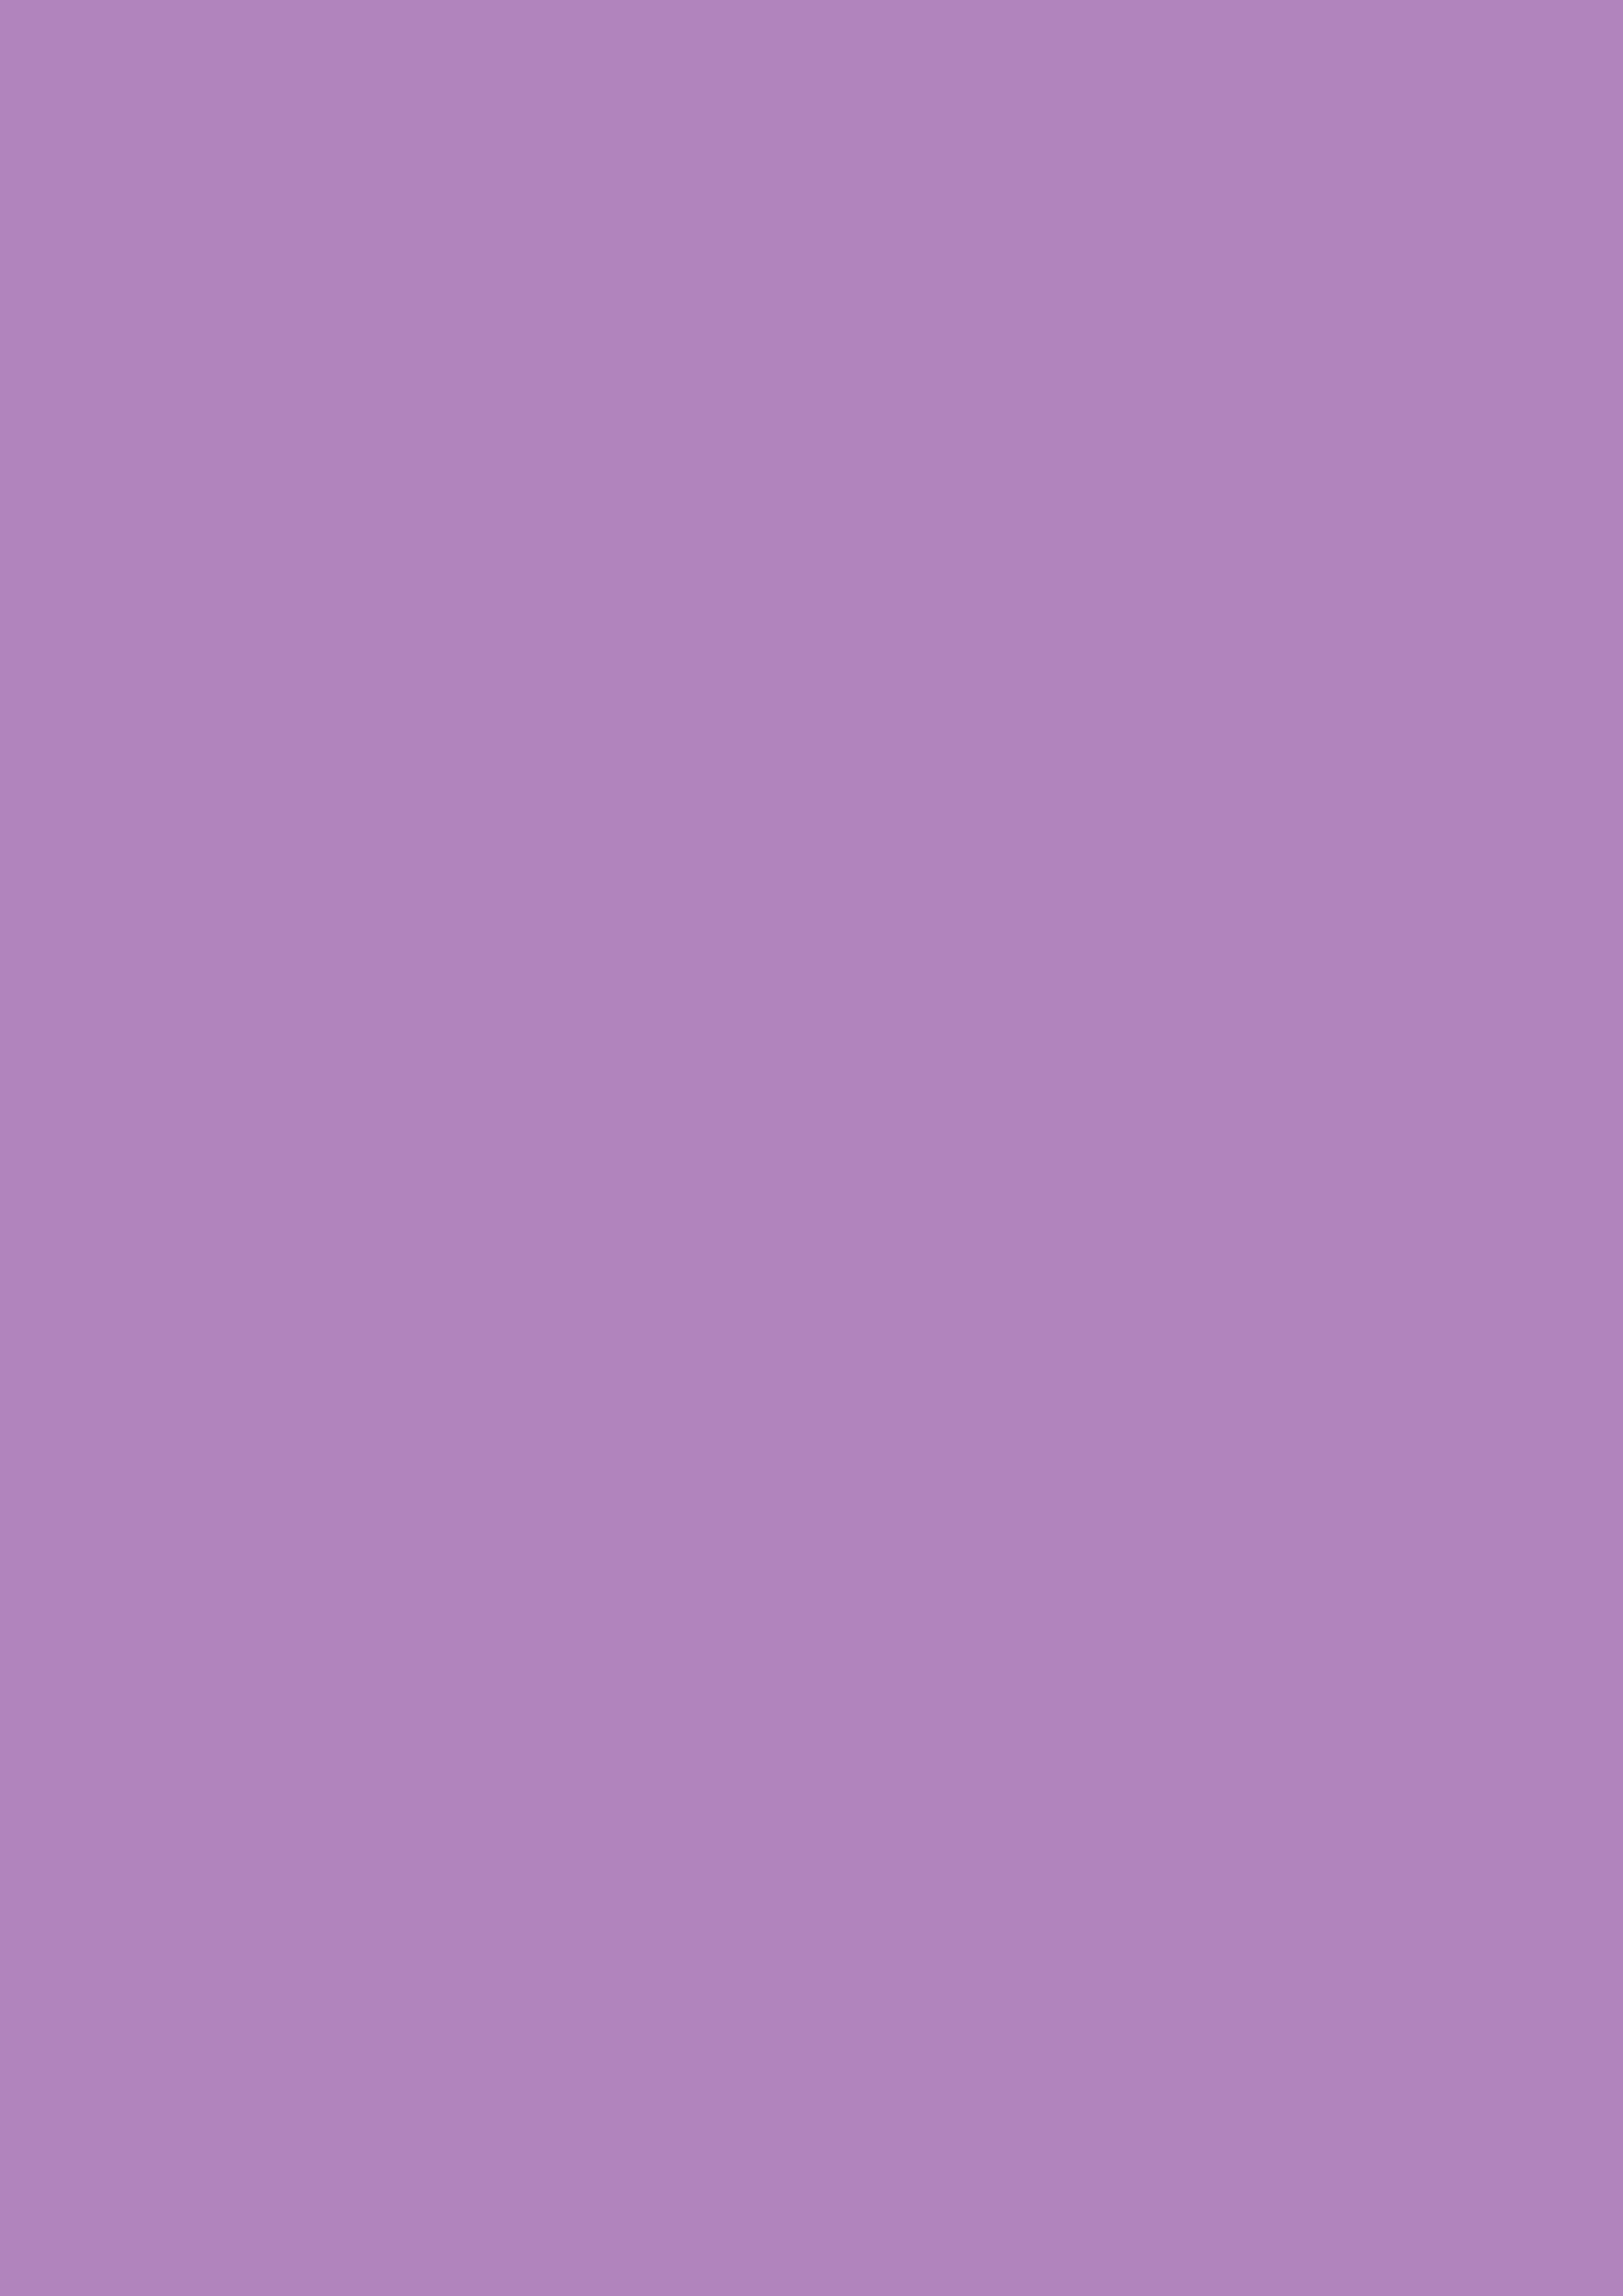 2480x3508 African Violet Solid Color Background